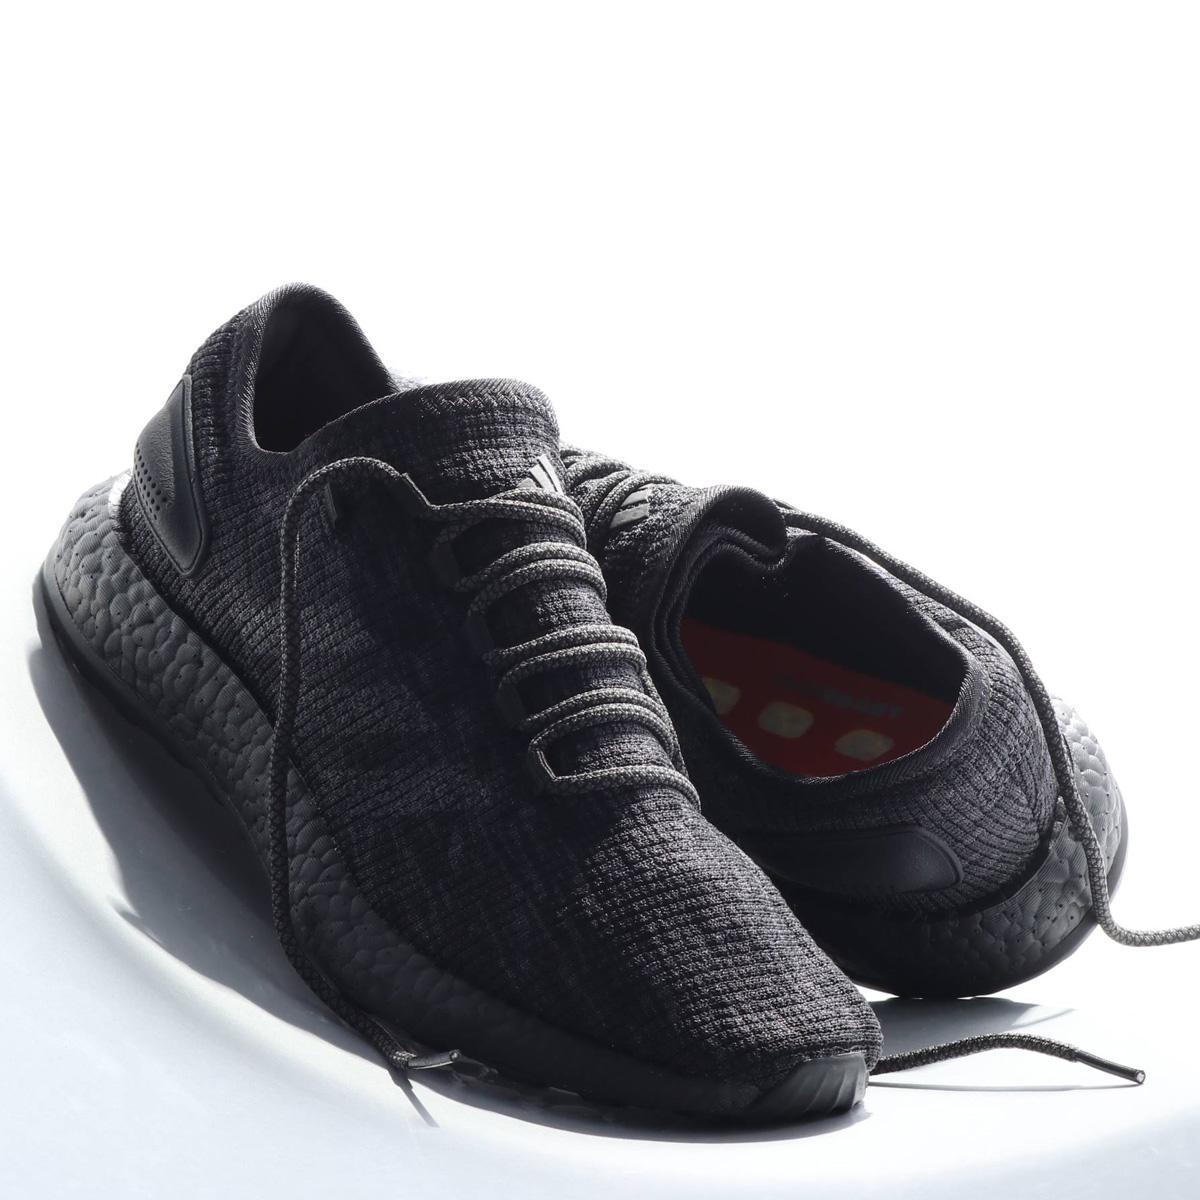 adidas PureBOOST(アディダス ピュアブースト)CORE BLACK / DGH SOLID GREY / HI-RES ORANGE【メンズ スニーカー】18FW-I